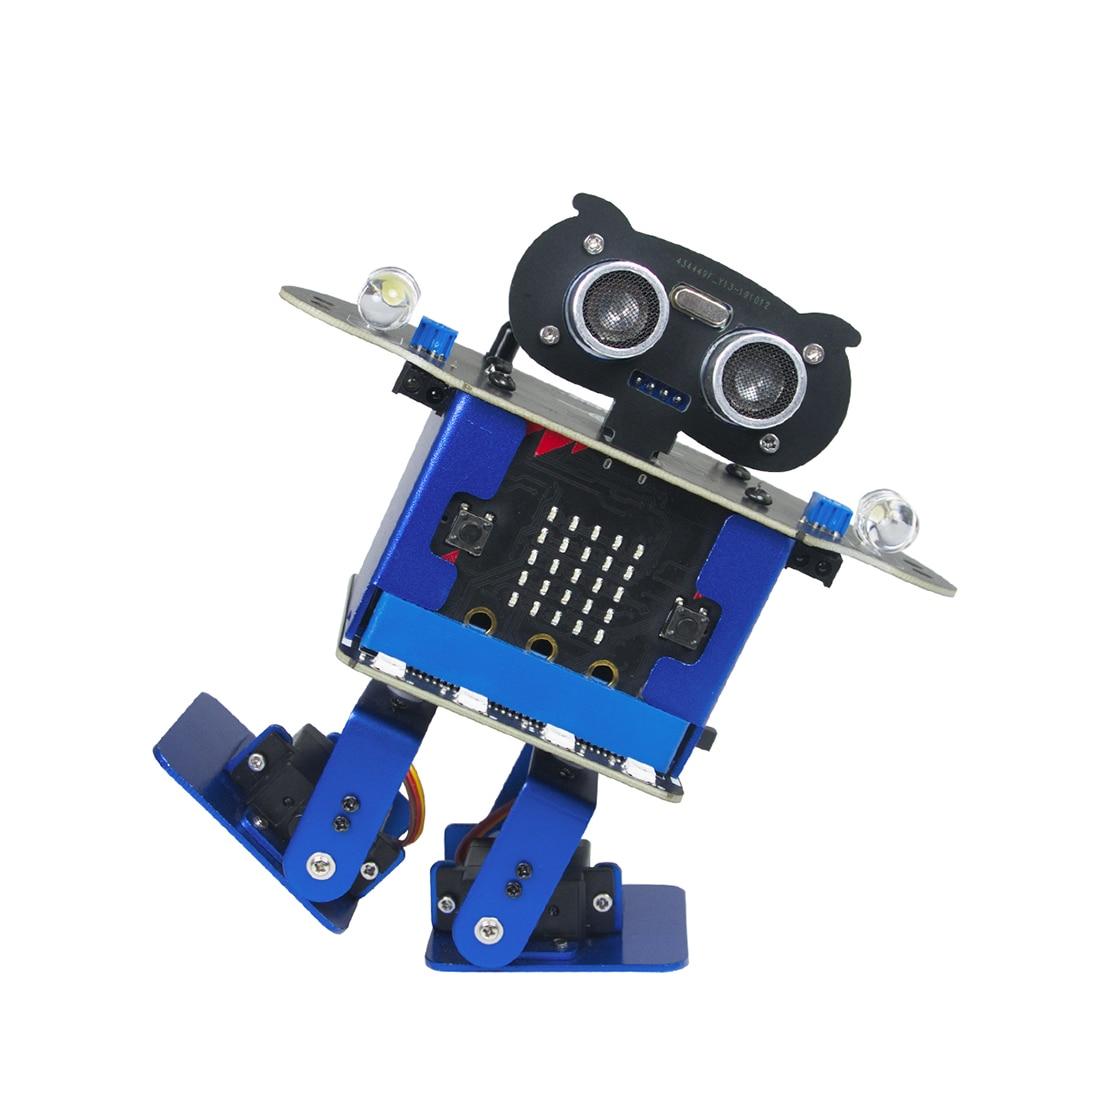 New Arrival Programmable Dancing Robot Bipedal Humanoid Microbit Robot DIY Programming Starter Kit For Microbit